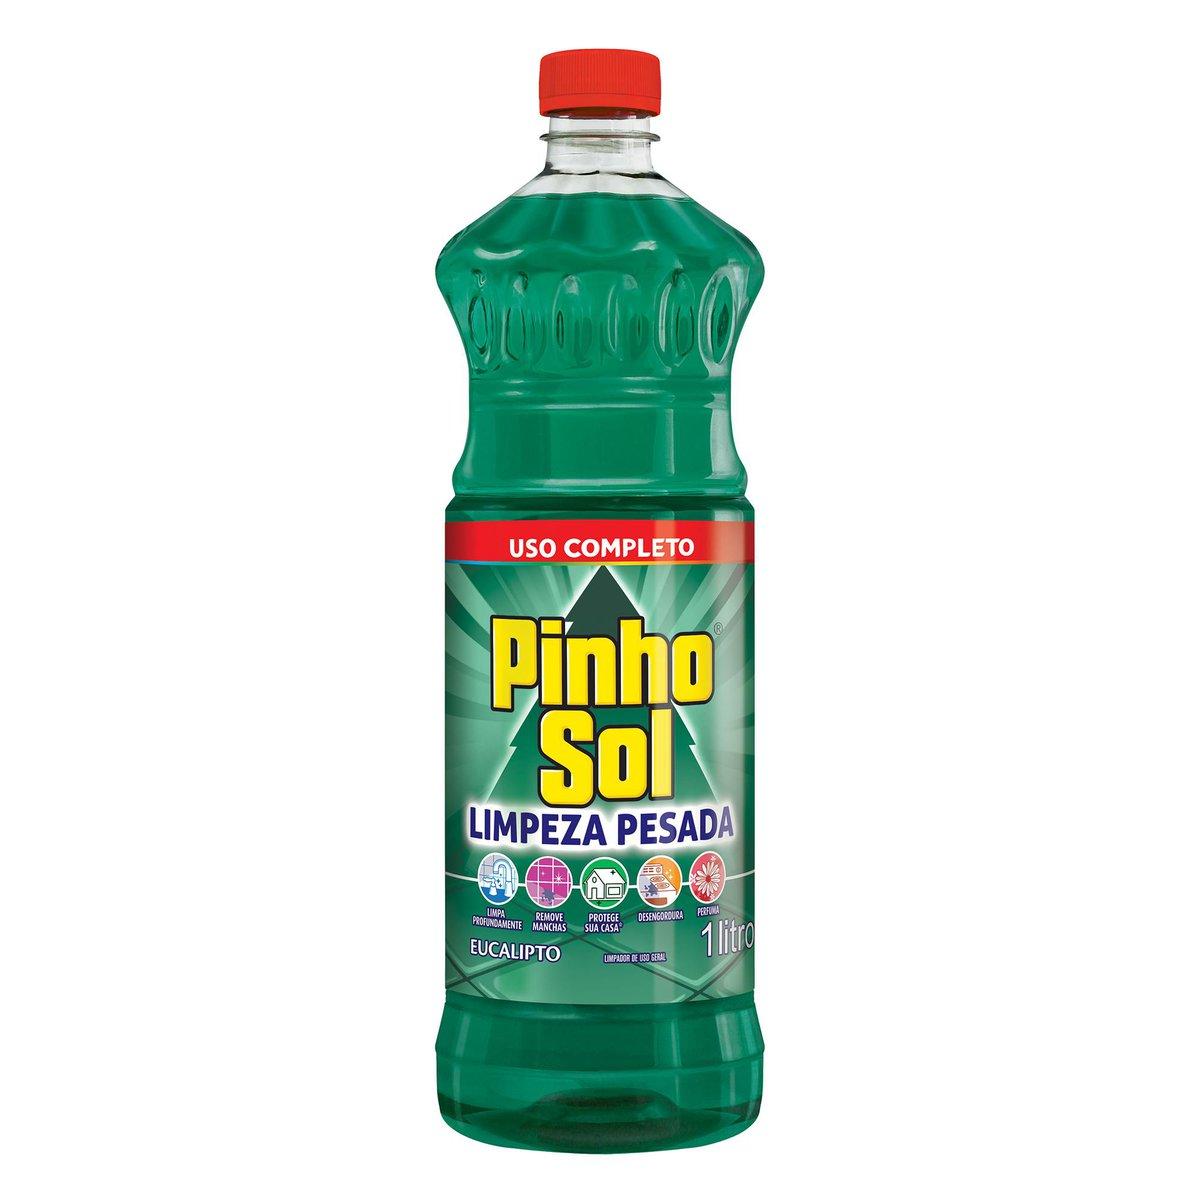 DESINF PINHO SOL LIMP P EUCA  1X1L(12)